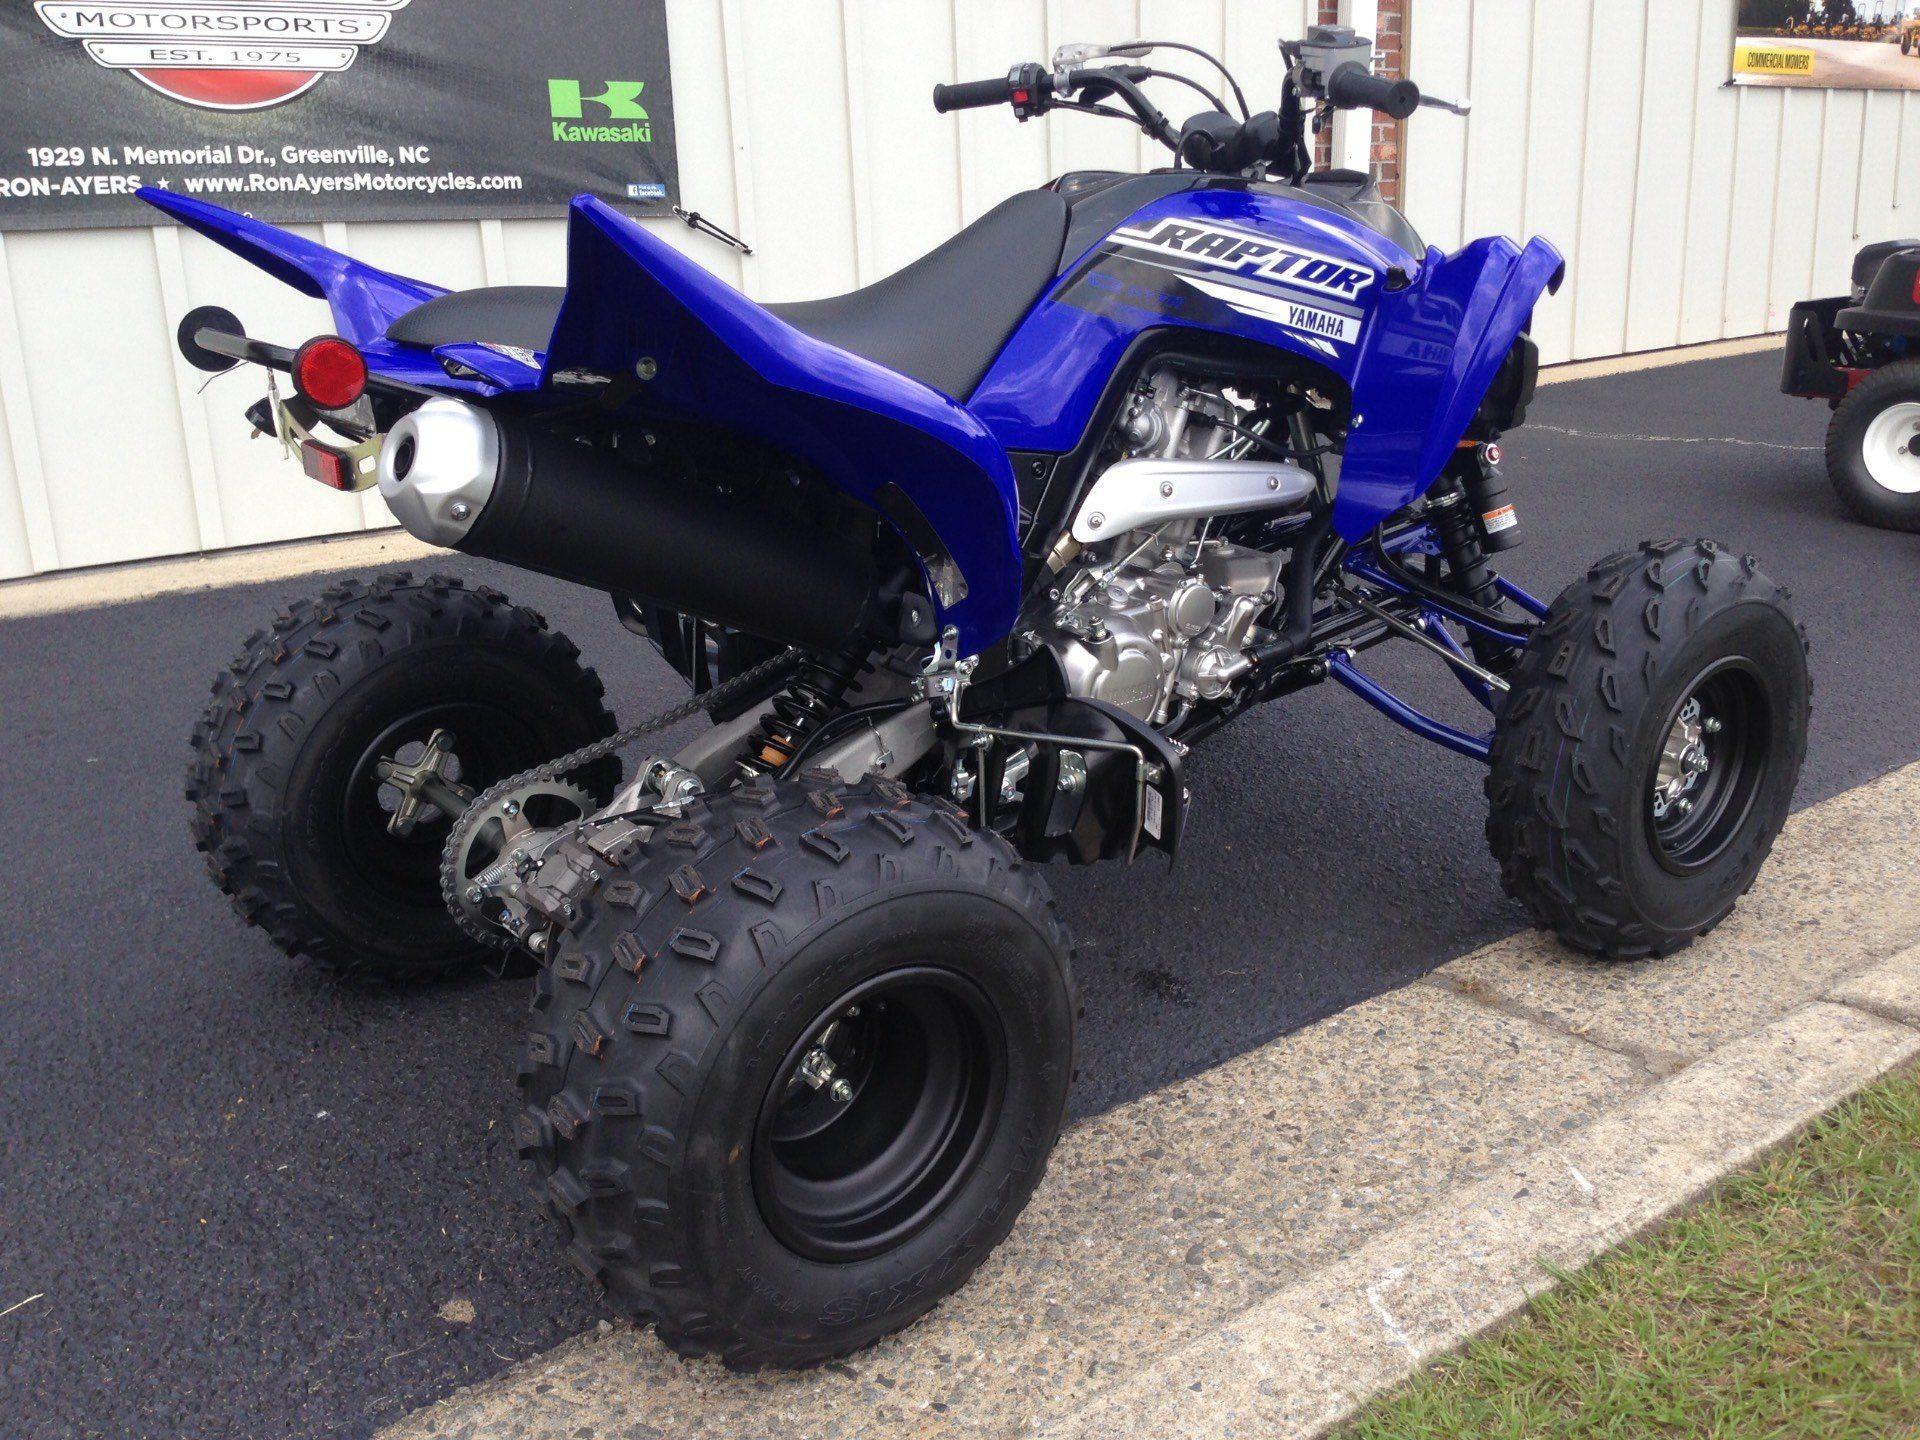 2019 Yamaha Raptor 700R 11